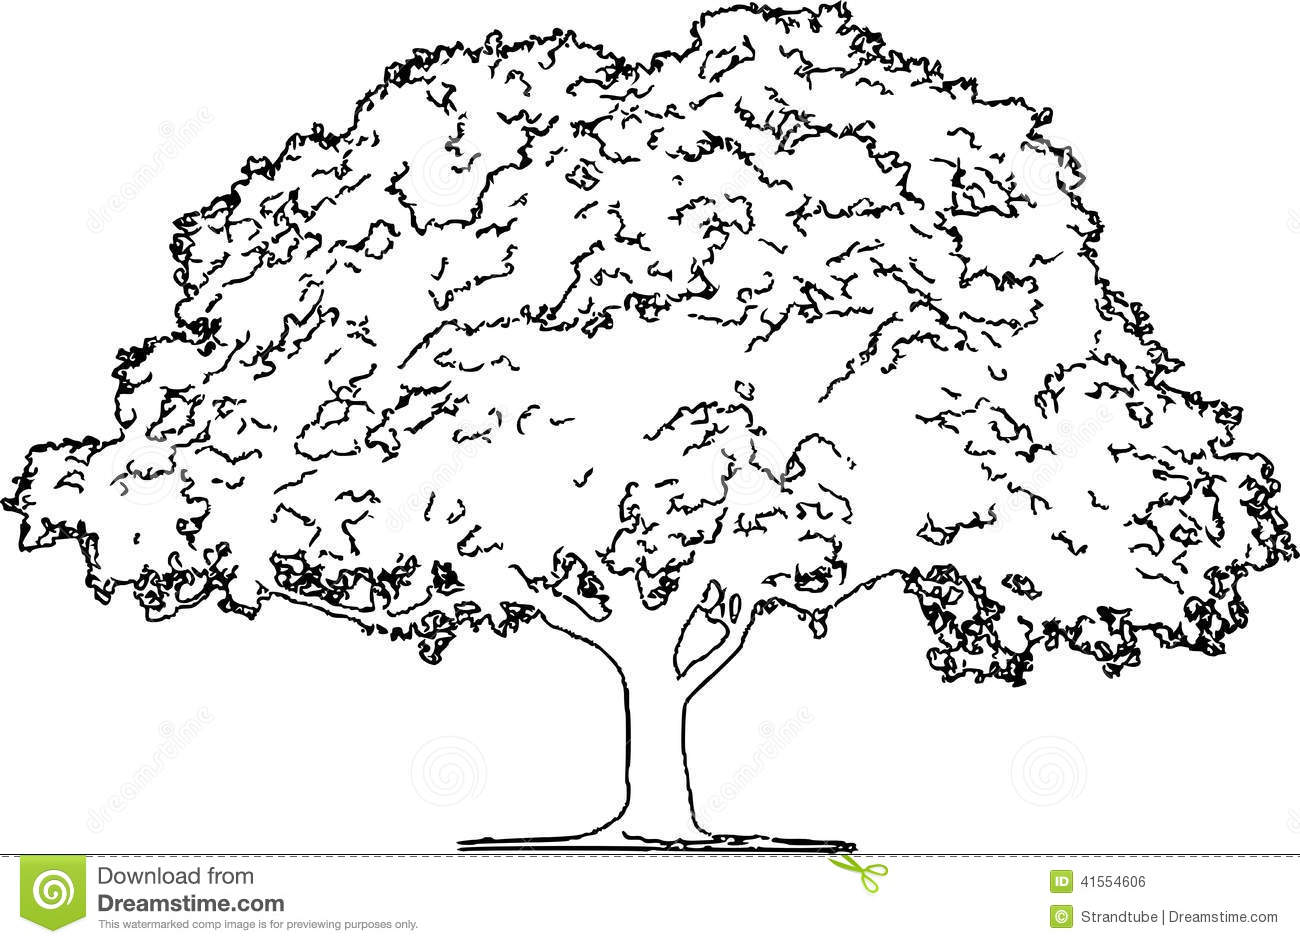 Major oak leaf clipart black and white image transparent Black And White Tree Sketch at PaintingValley.com | Explore ... image transparent